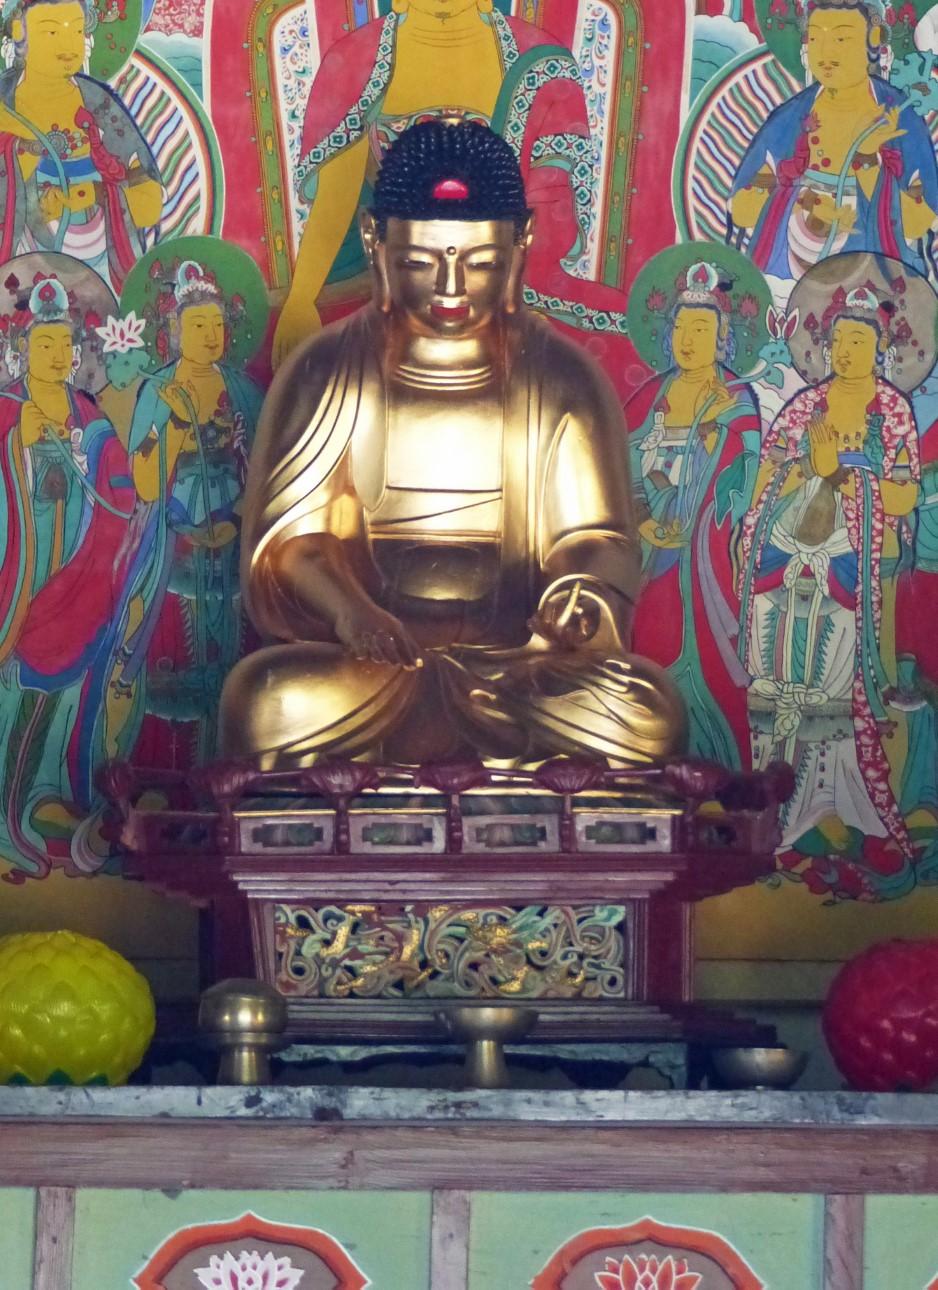 Gold Buddha statue on an altar